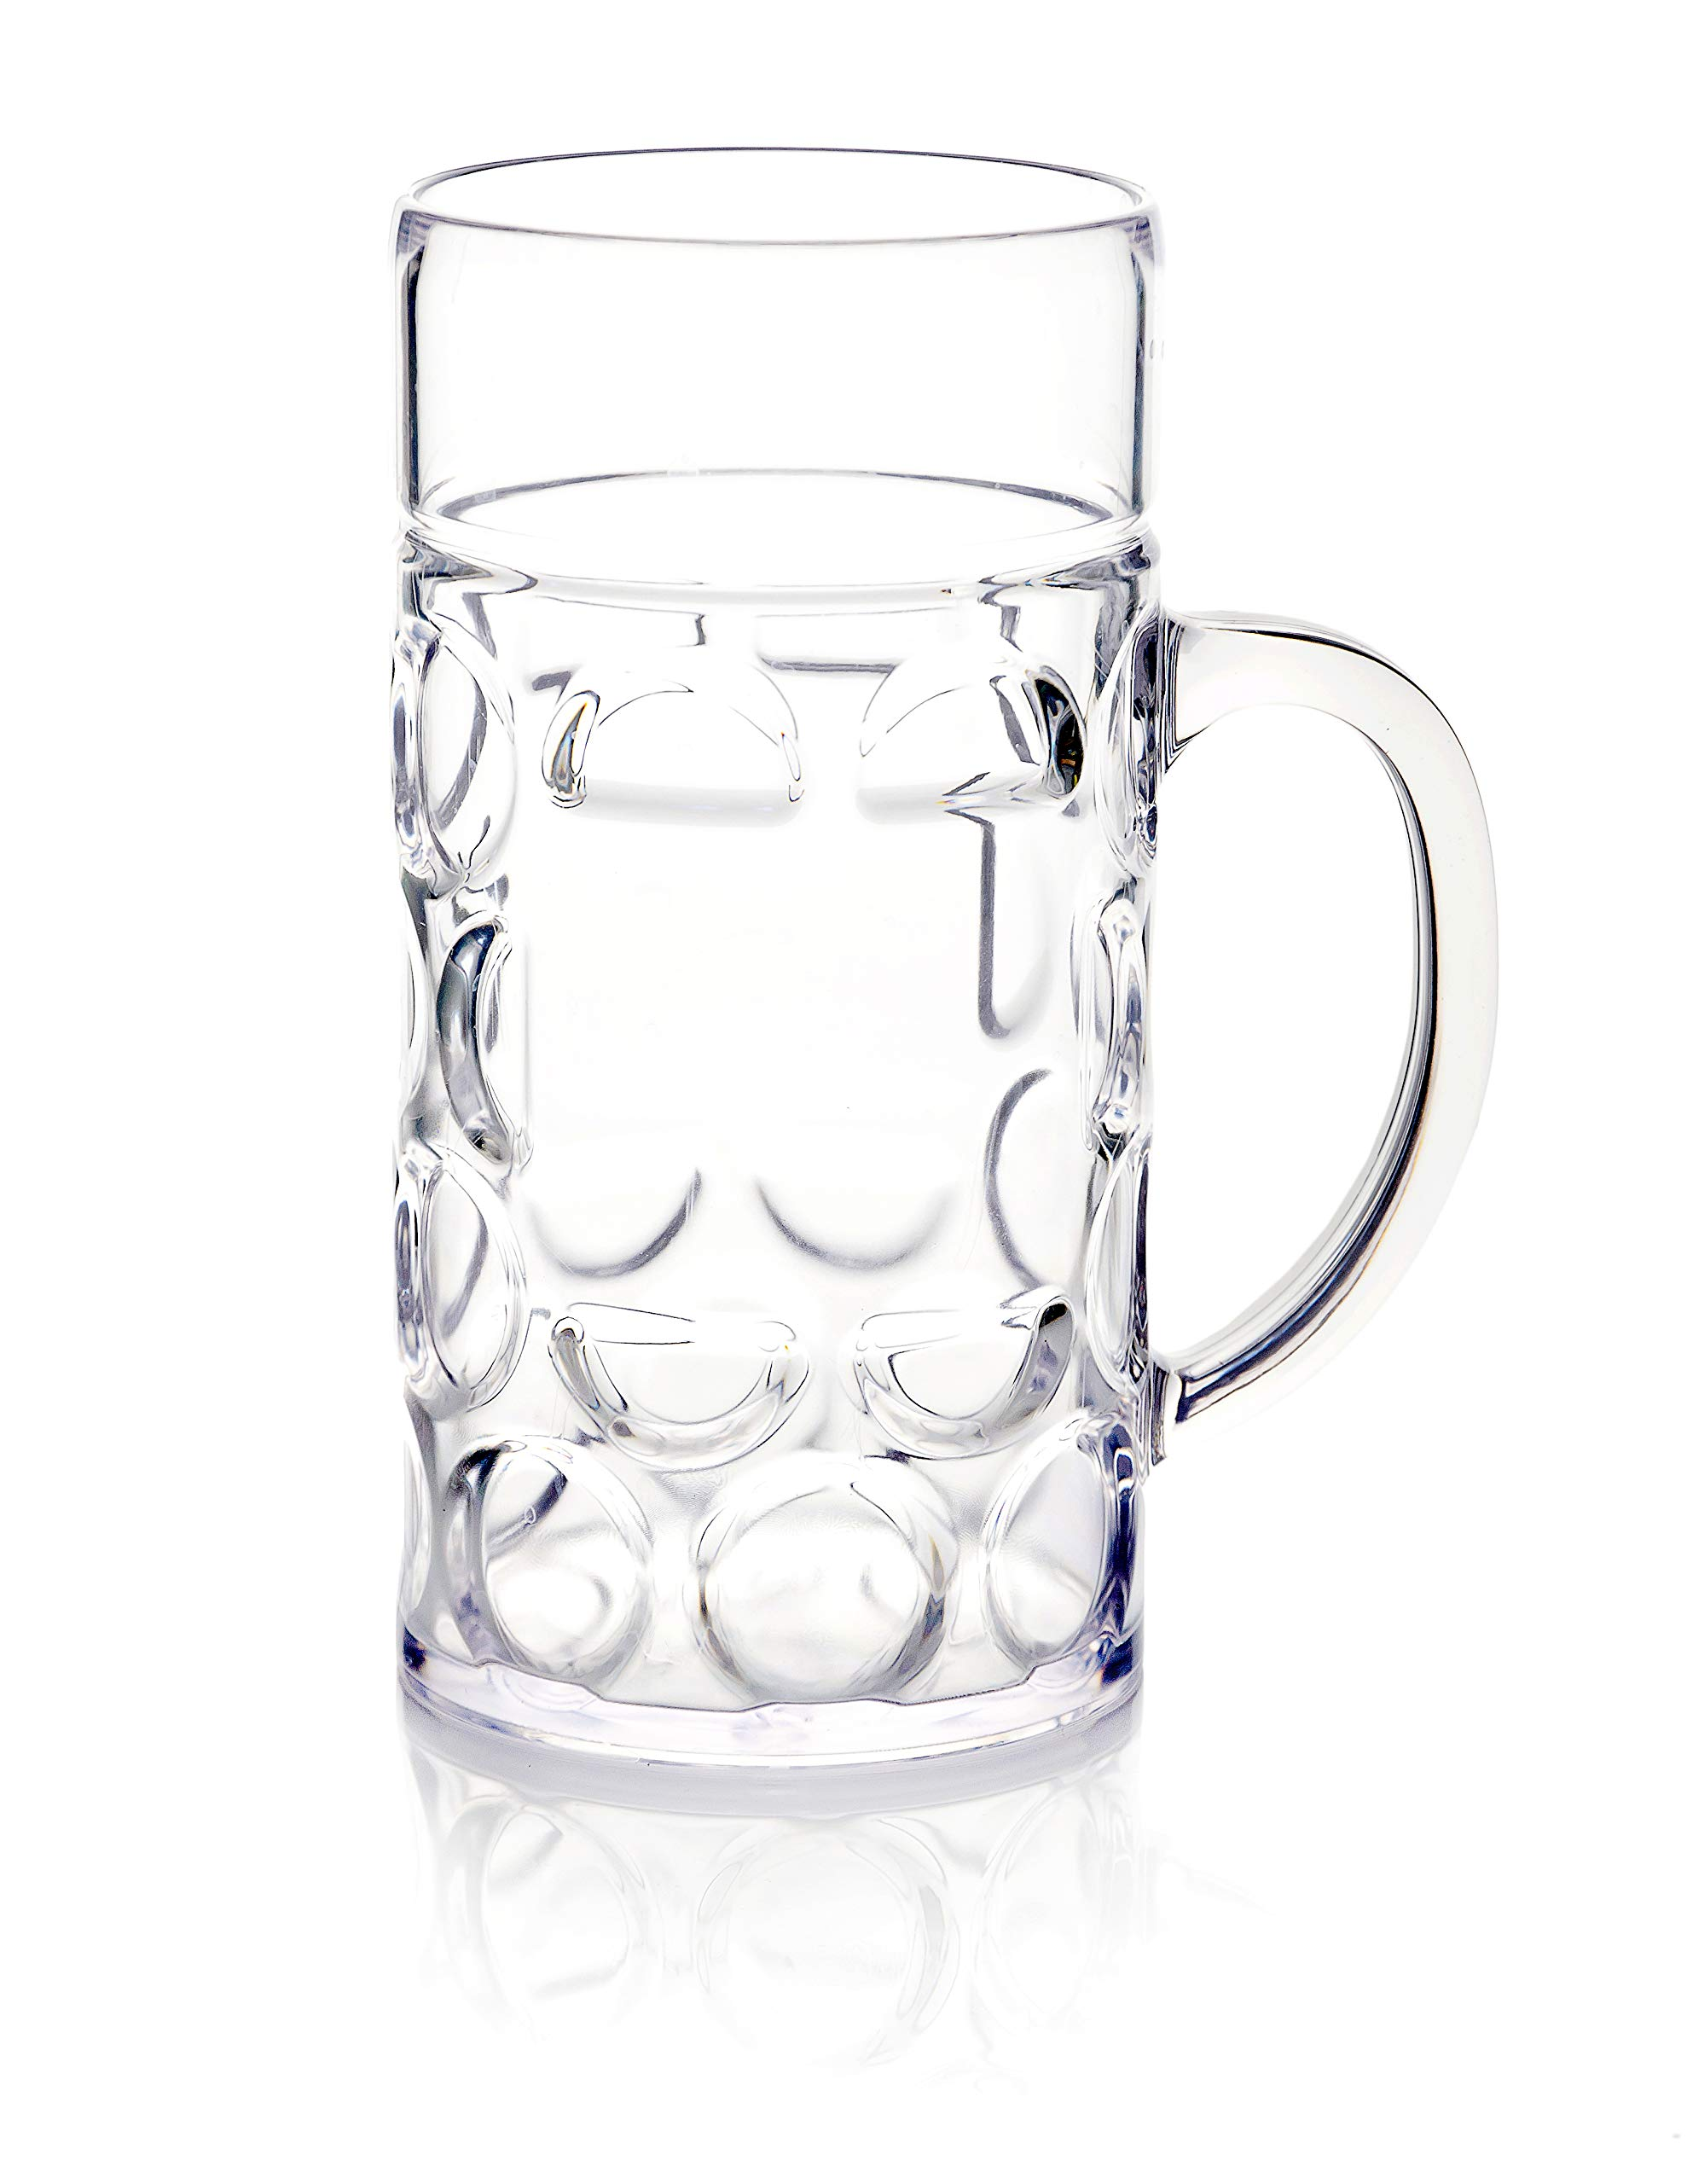 32oz Plastic Beer Mug Bierstein (1 liter) with Handles, Reusable, Dishwasher Safe, Plastic for Indoor/Outdoor Use